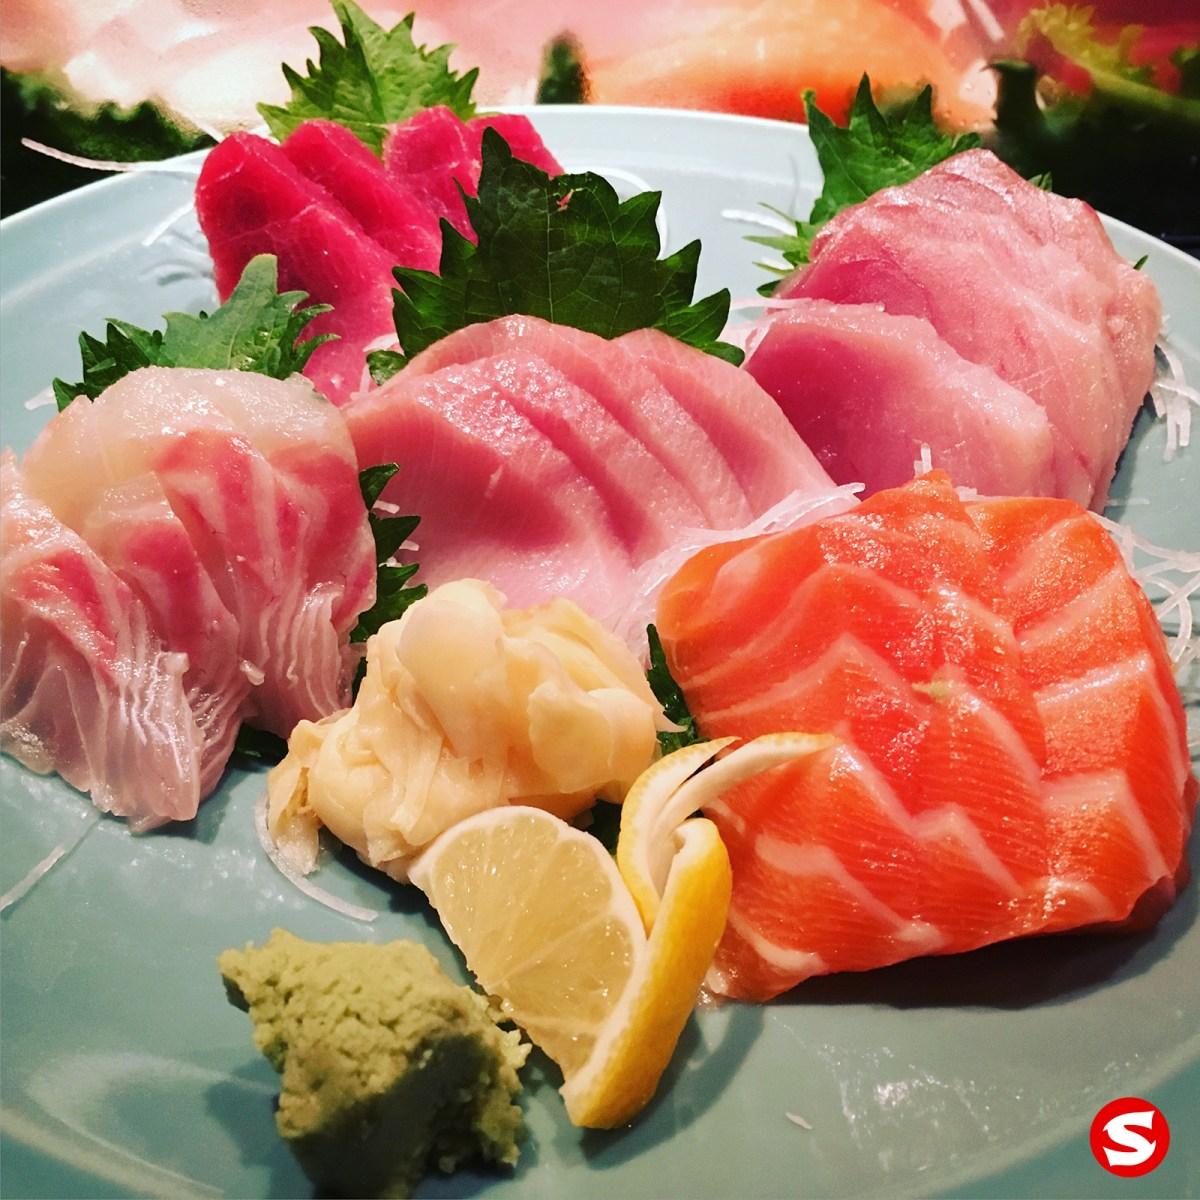 maguro (tuna), cobia (finfish), hamachi (yellowtail), kanpachi (amber jack), sake (salmon) sashimi